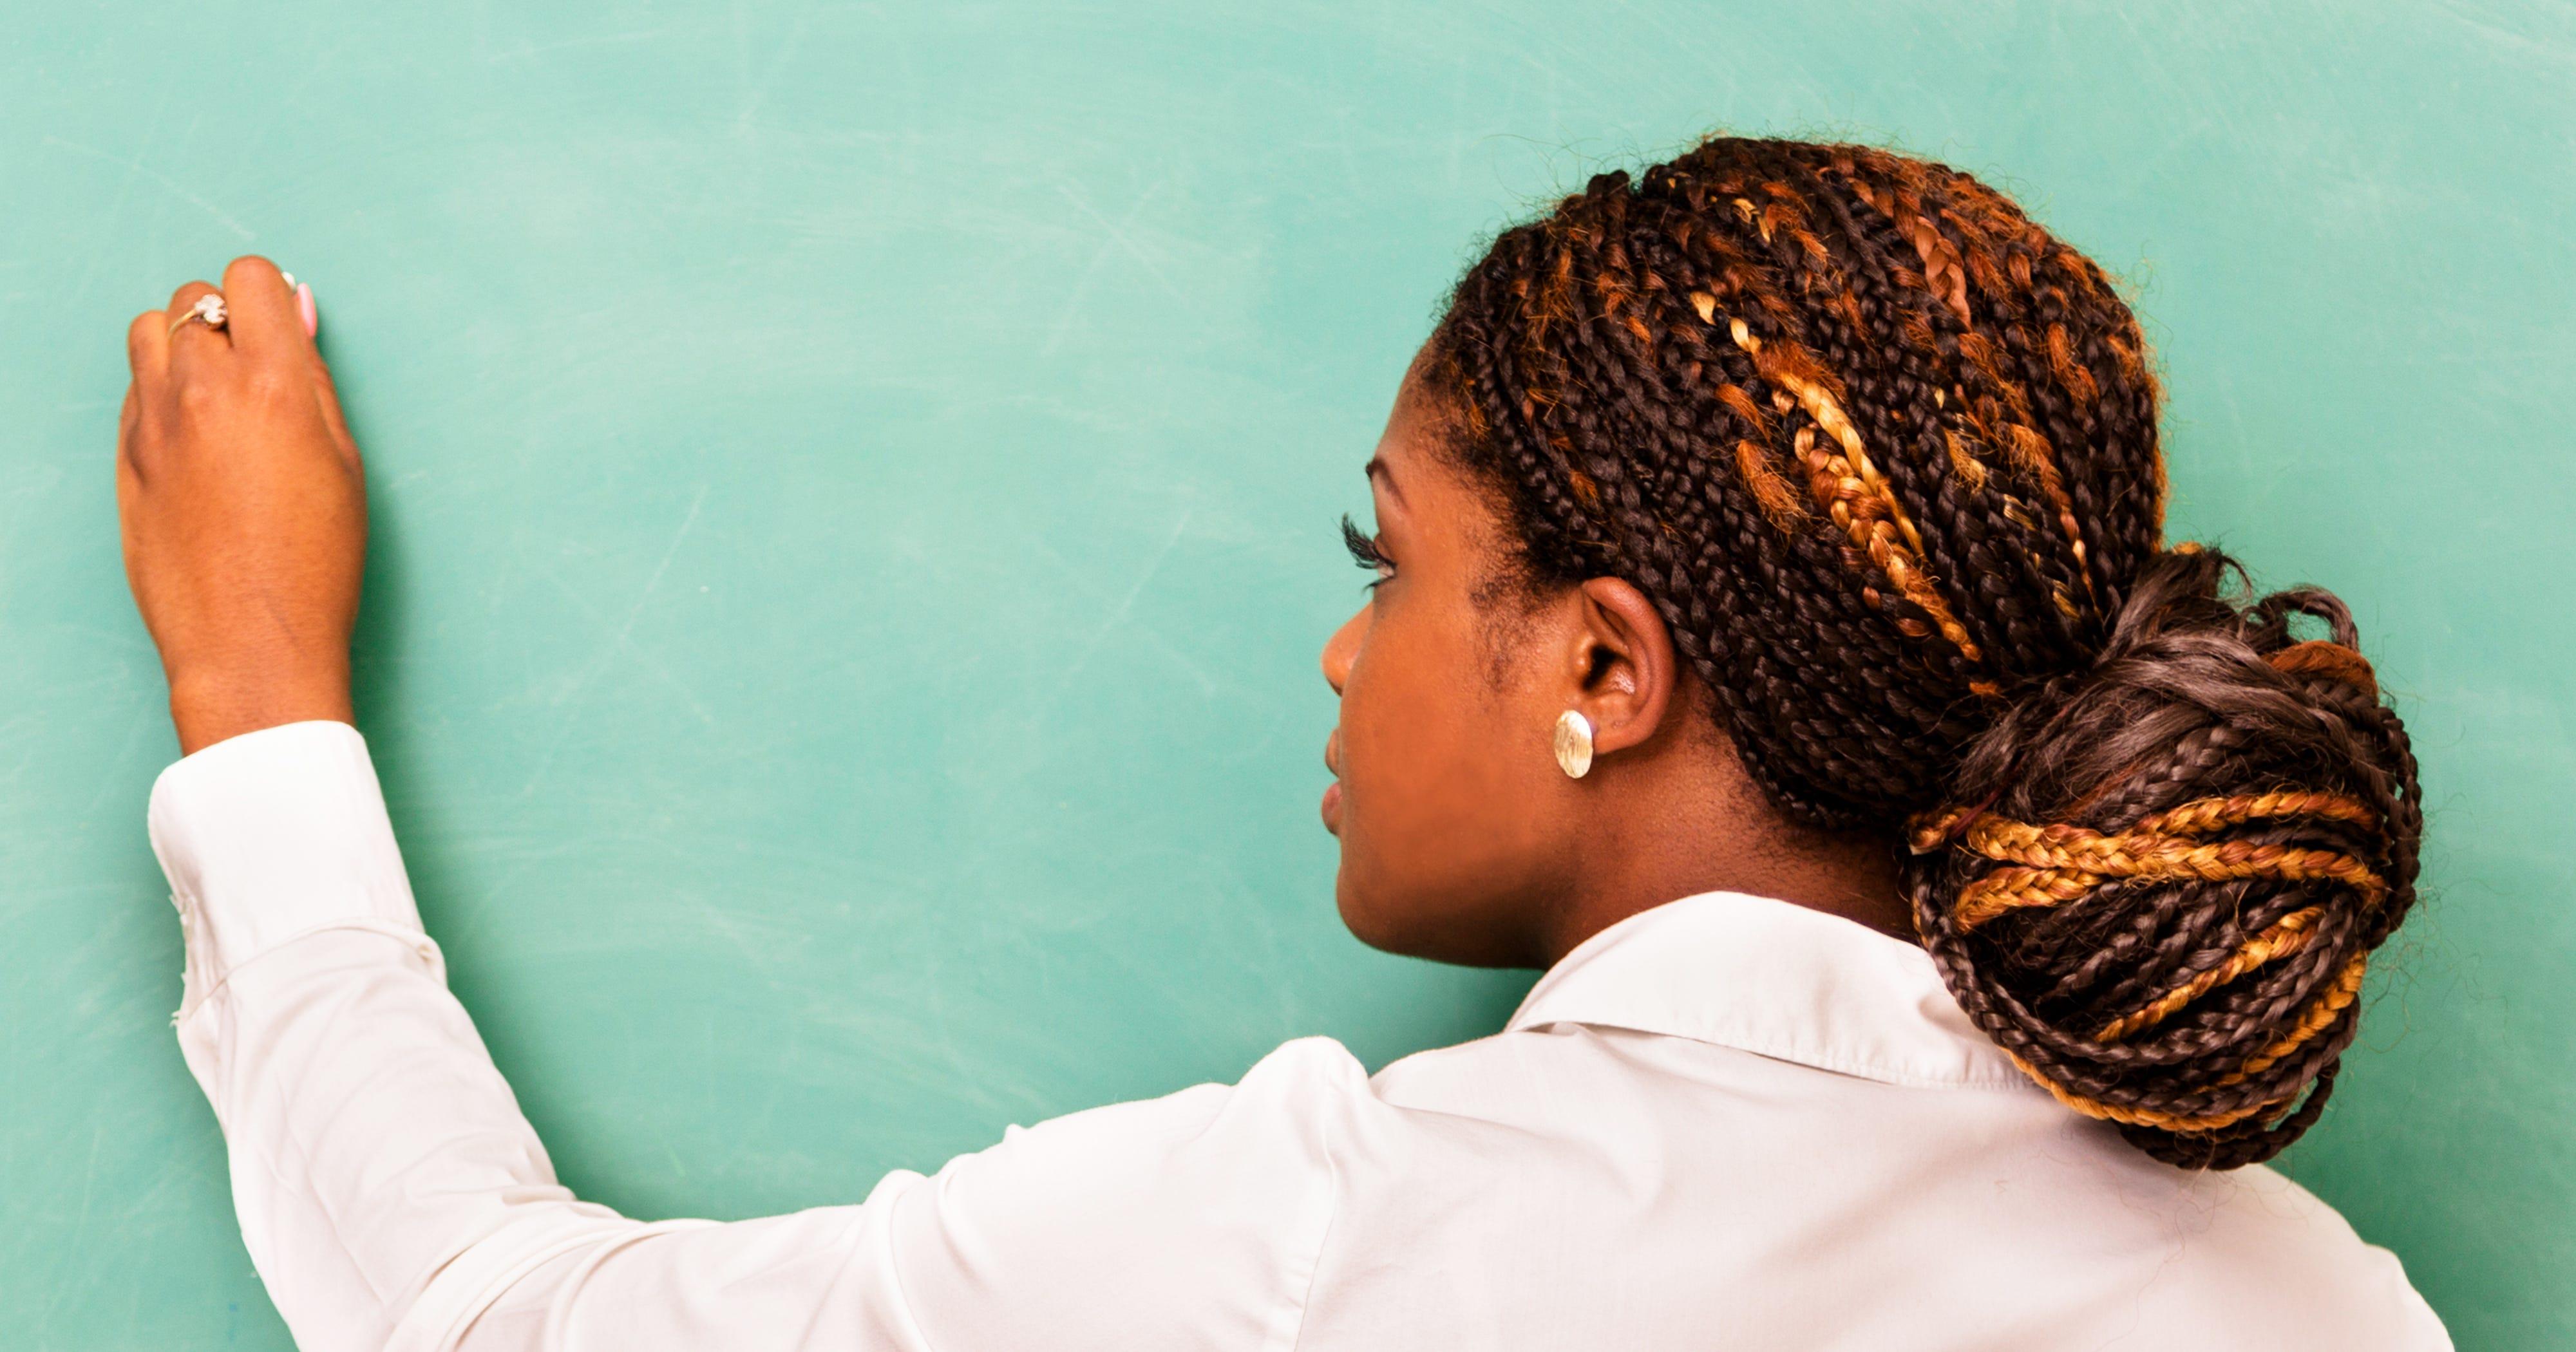 I Make $103,000 As A School Psychologist